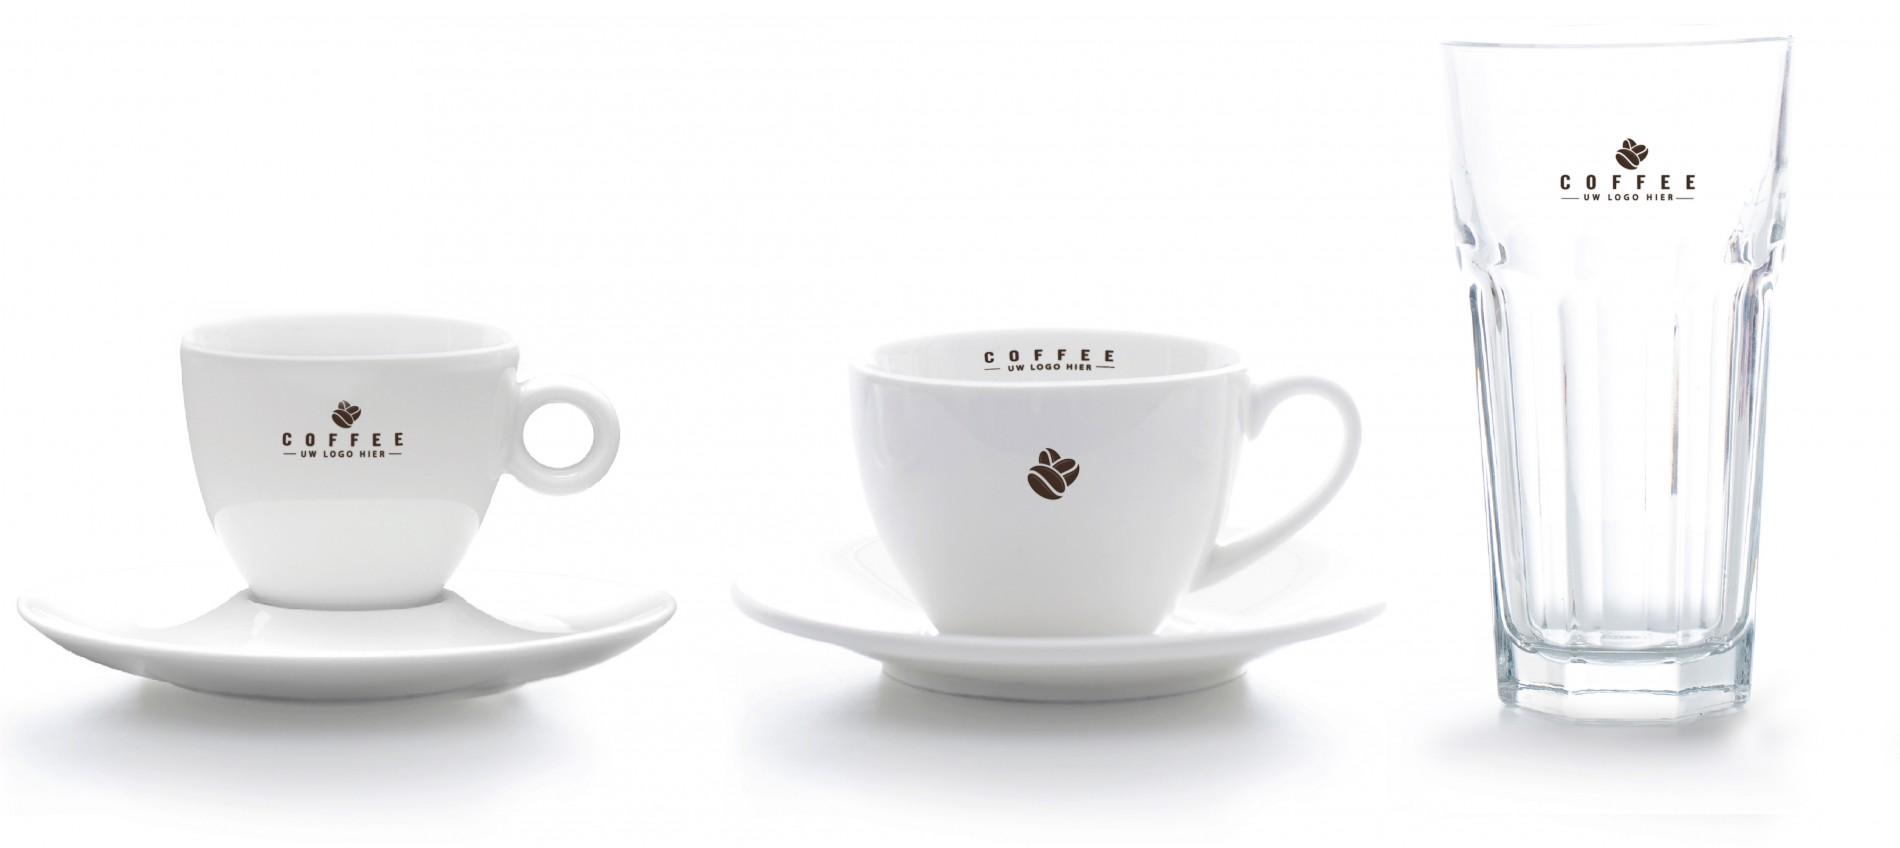 Eigen koffiemerk